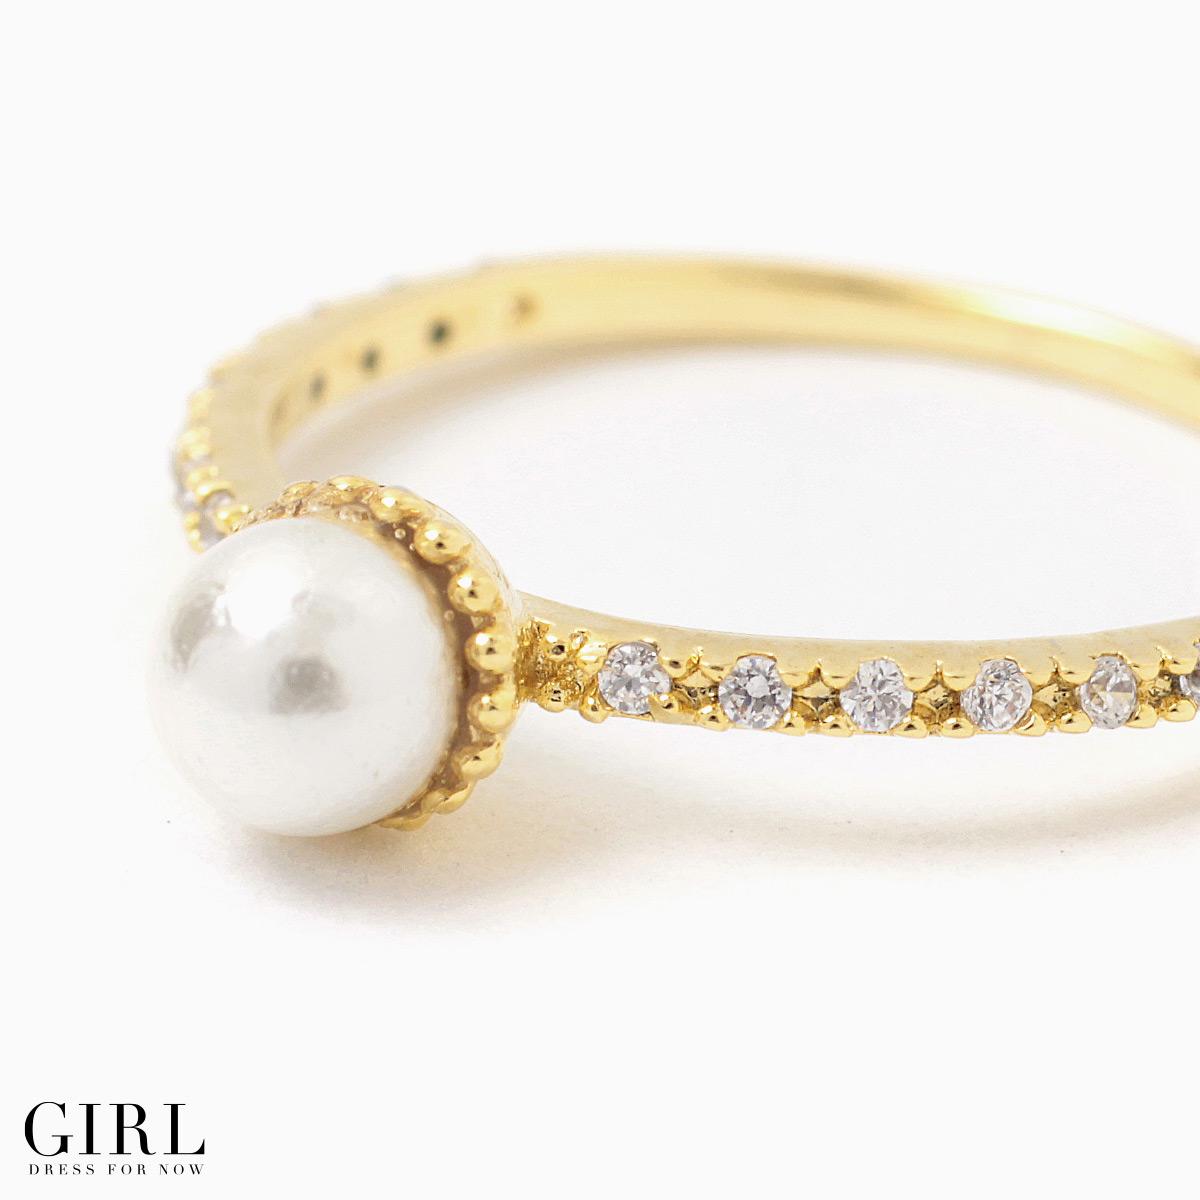 Dress shop GIRL   Rakuten Global Market: Silver accessories Shin ...